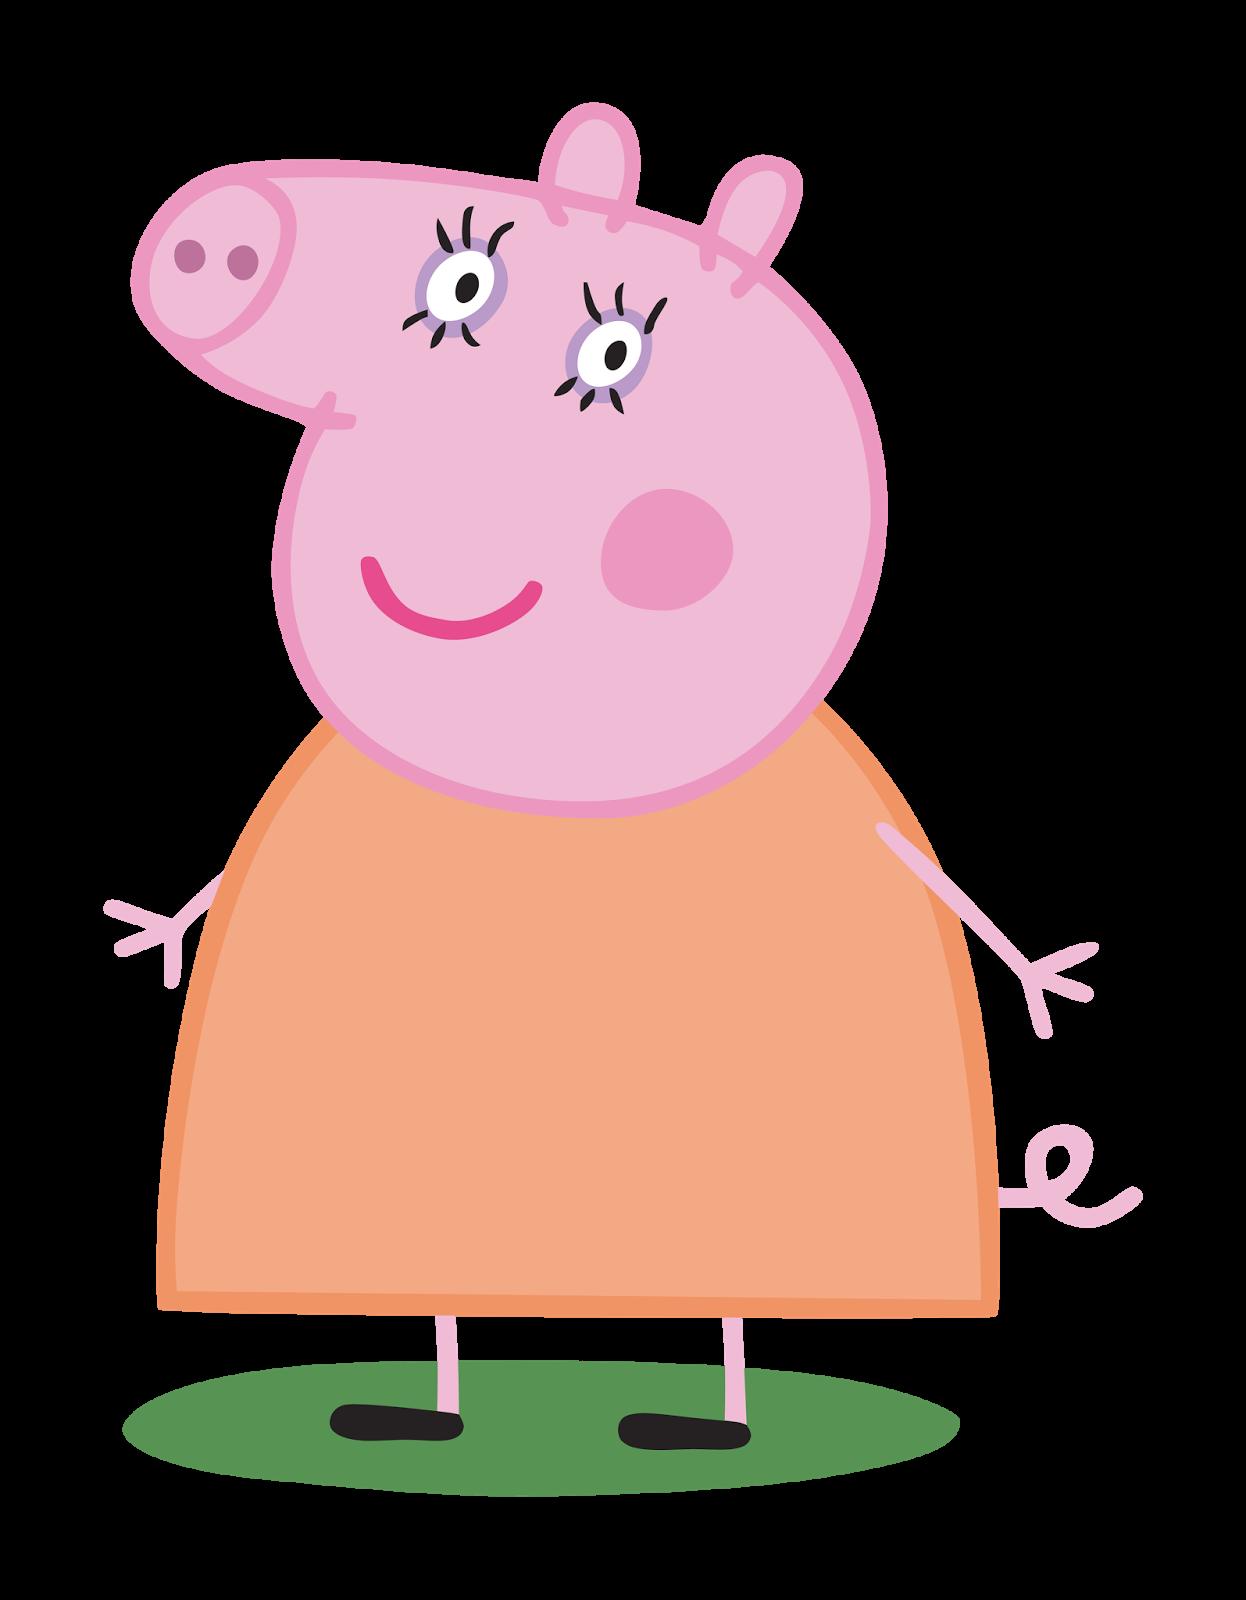 Свинки пеппа картинка